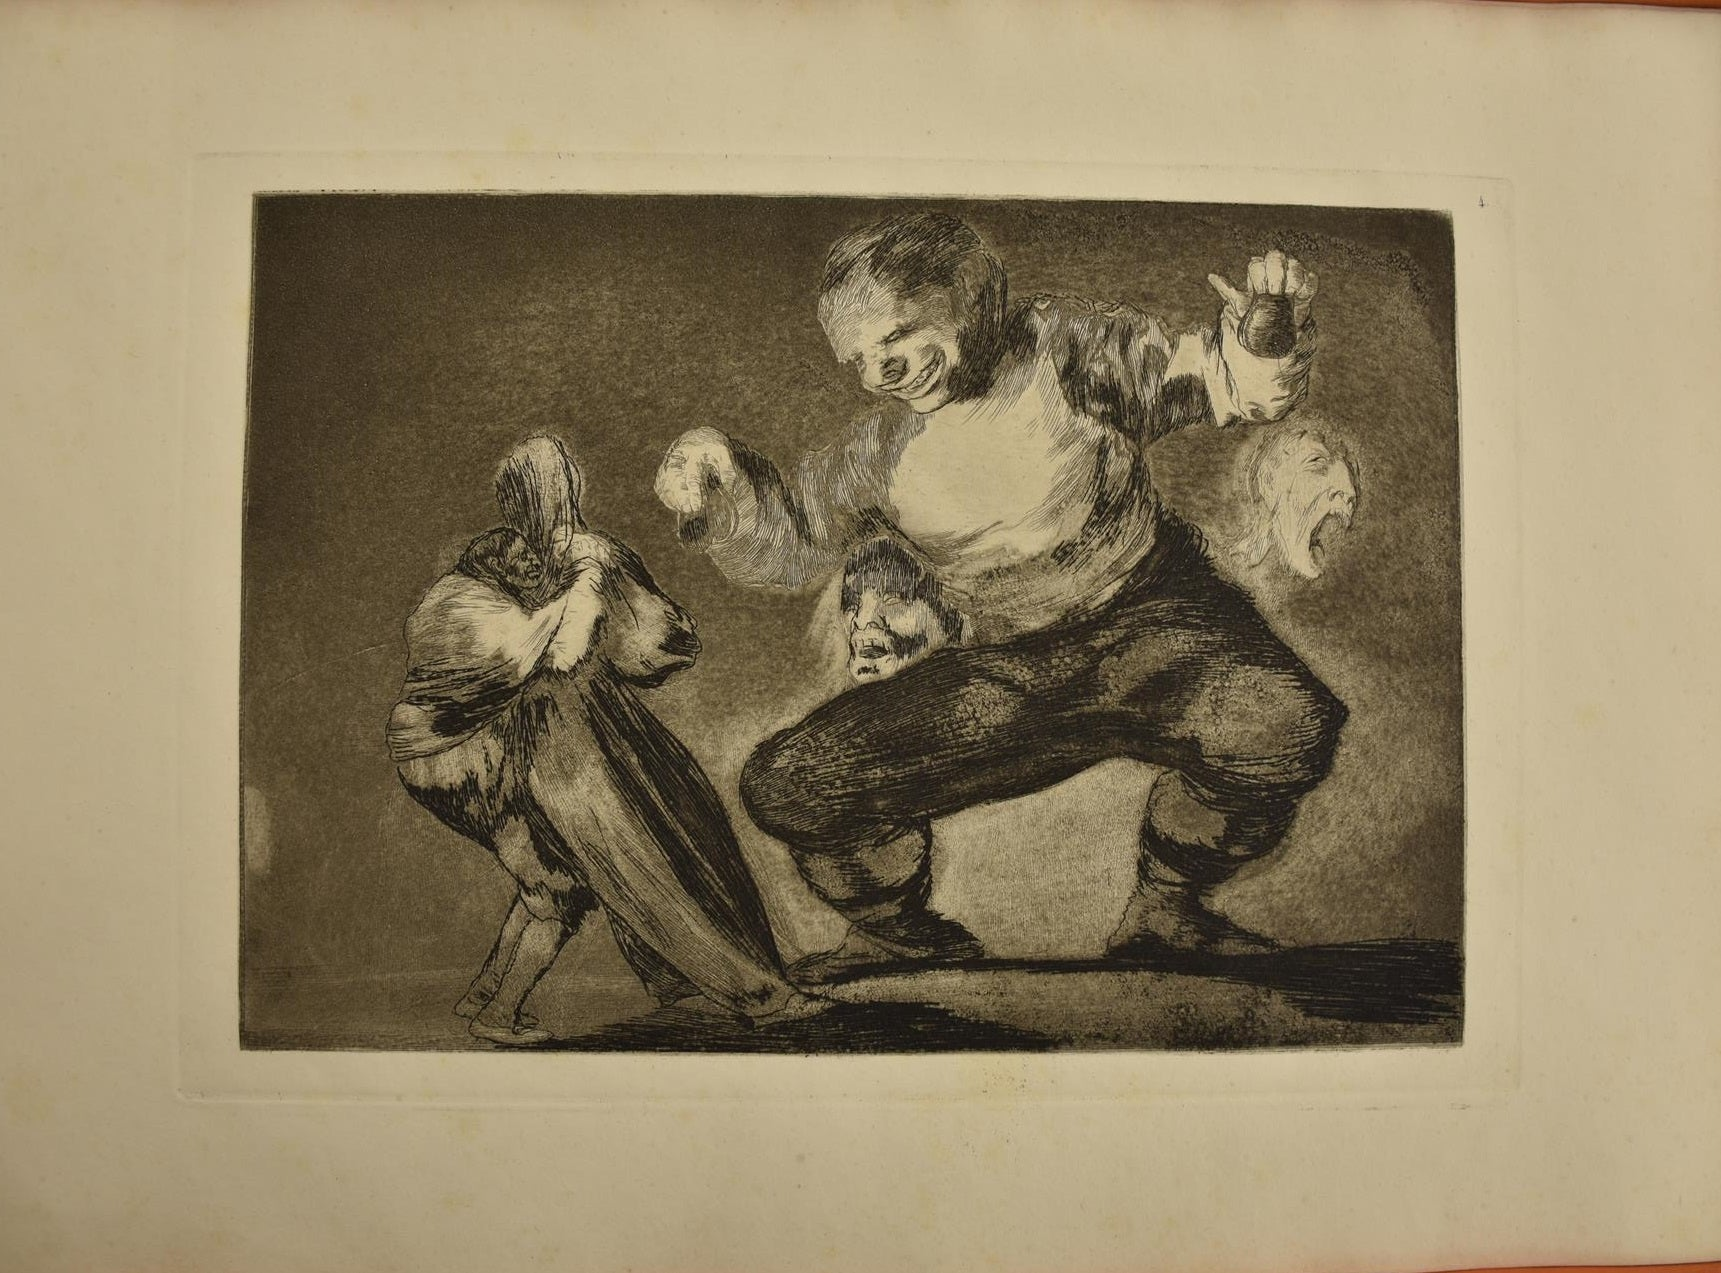 Follies A Way of Flying: Fine Art Print 13 Goya Prints: Los Disparates : No